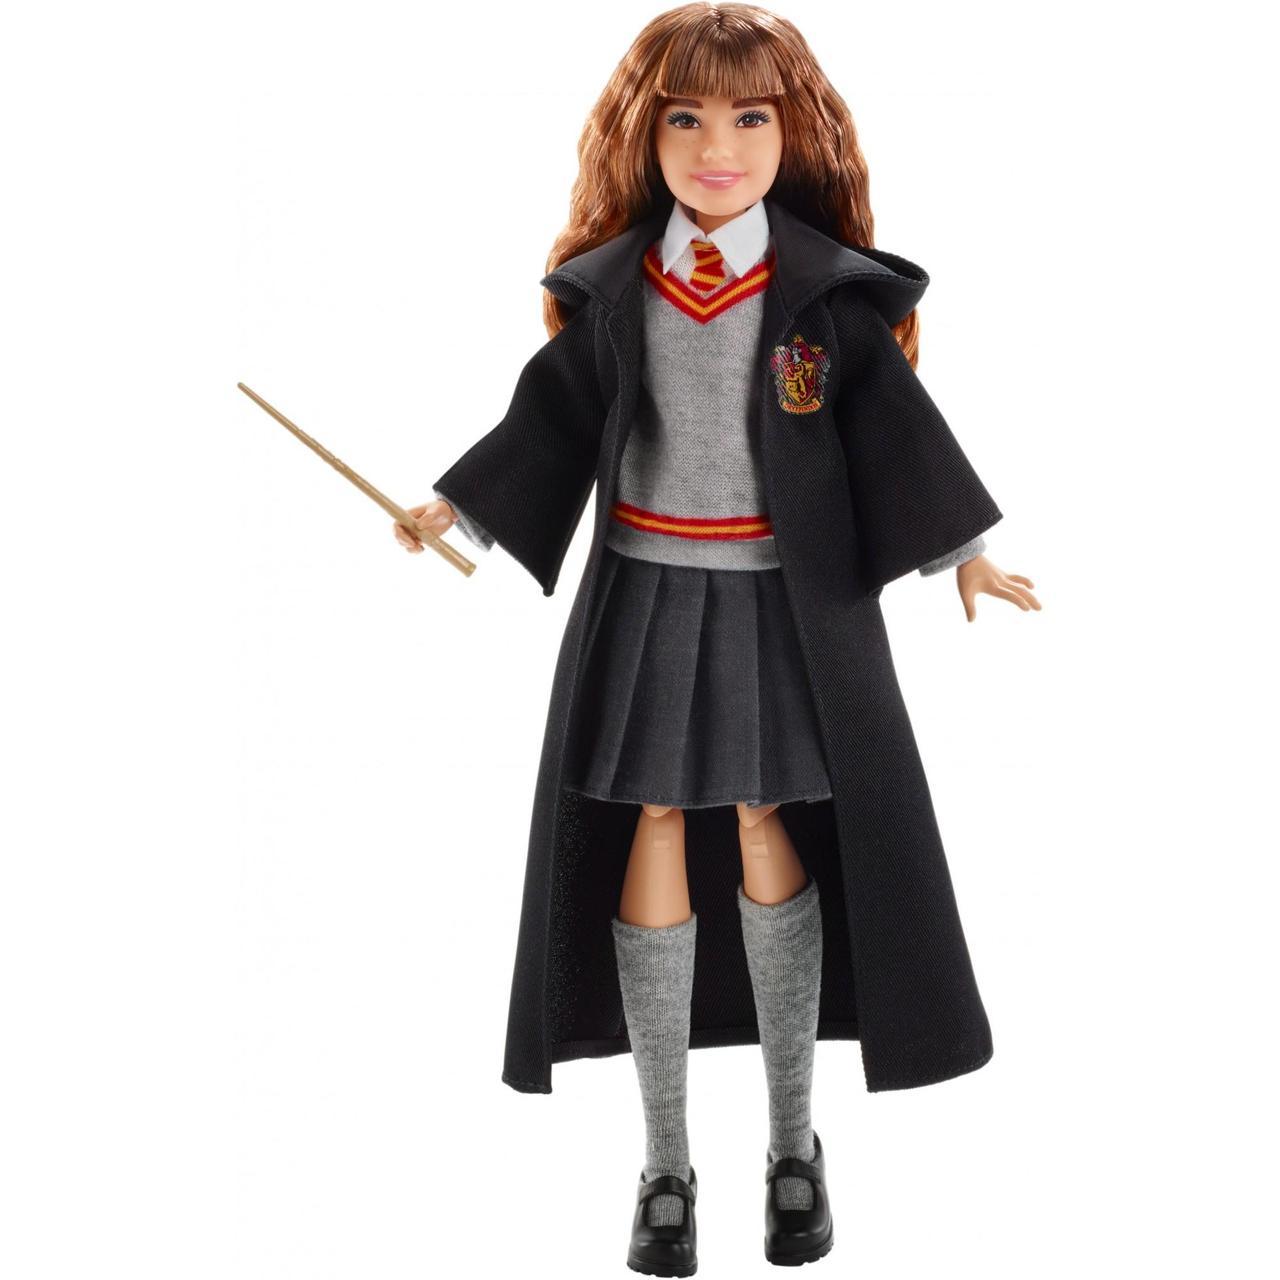 Кукла Гермиона Грейнджер Гарри Поттер Harry Potter Hermoine Granger Doll Hermione оригинал Mattel